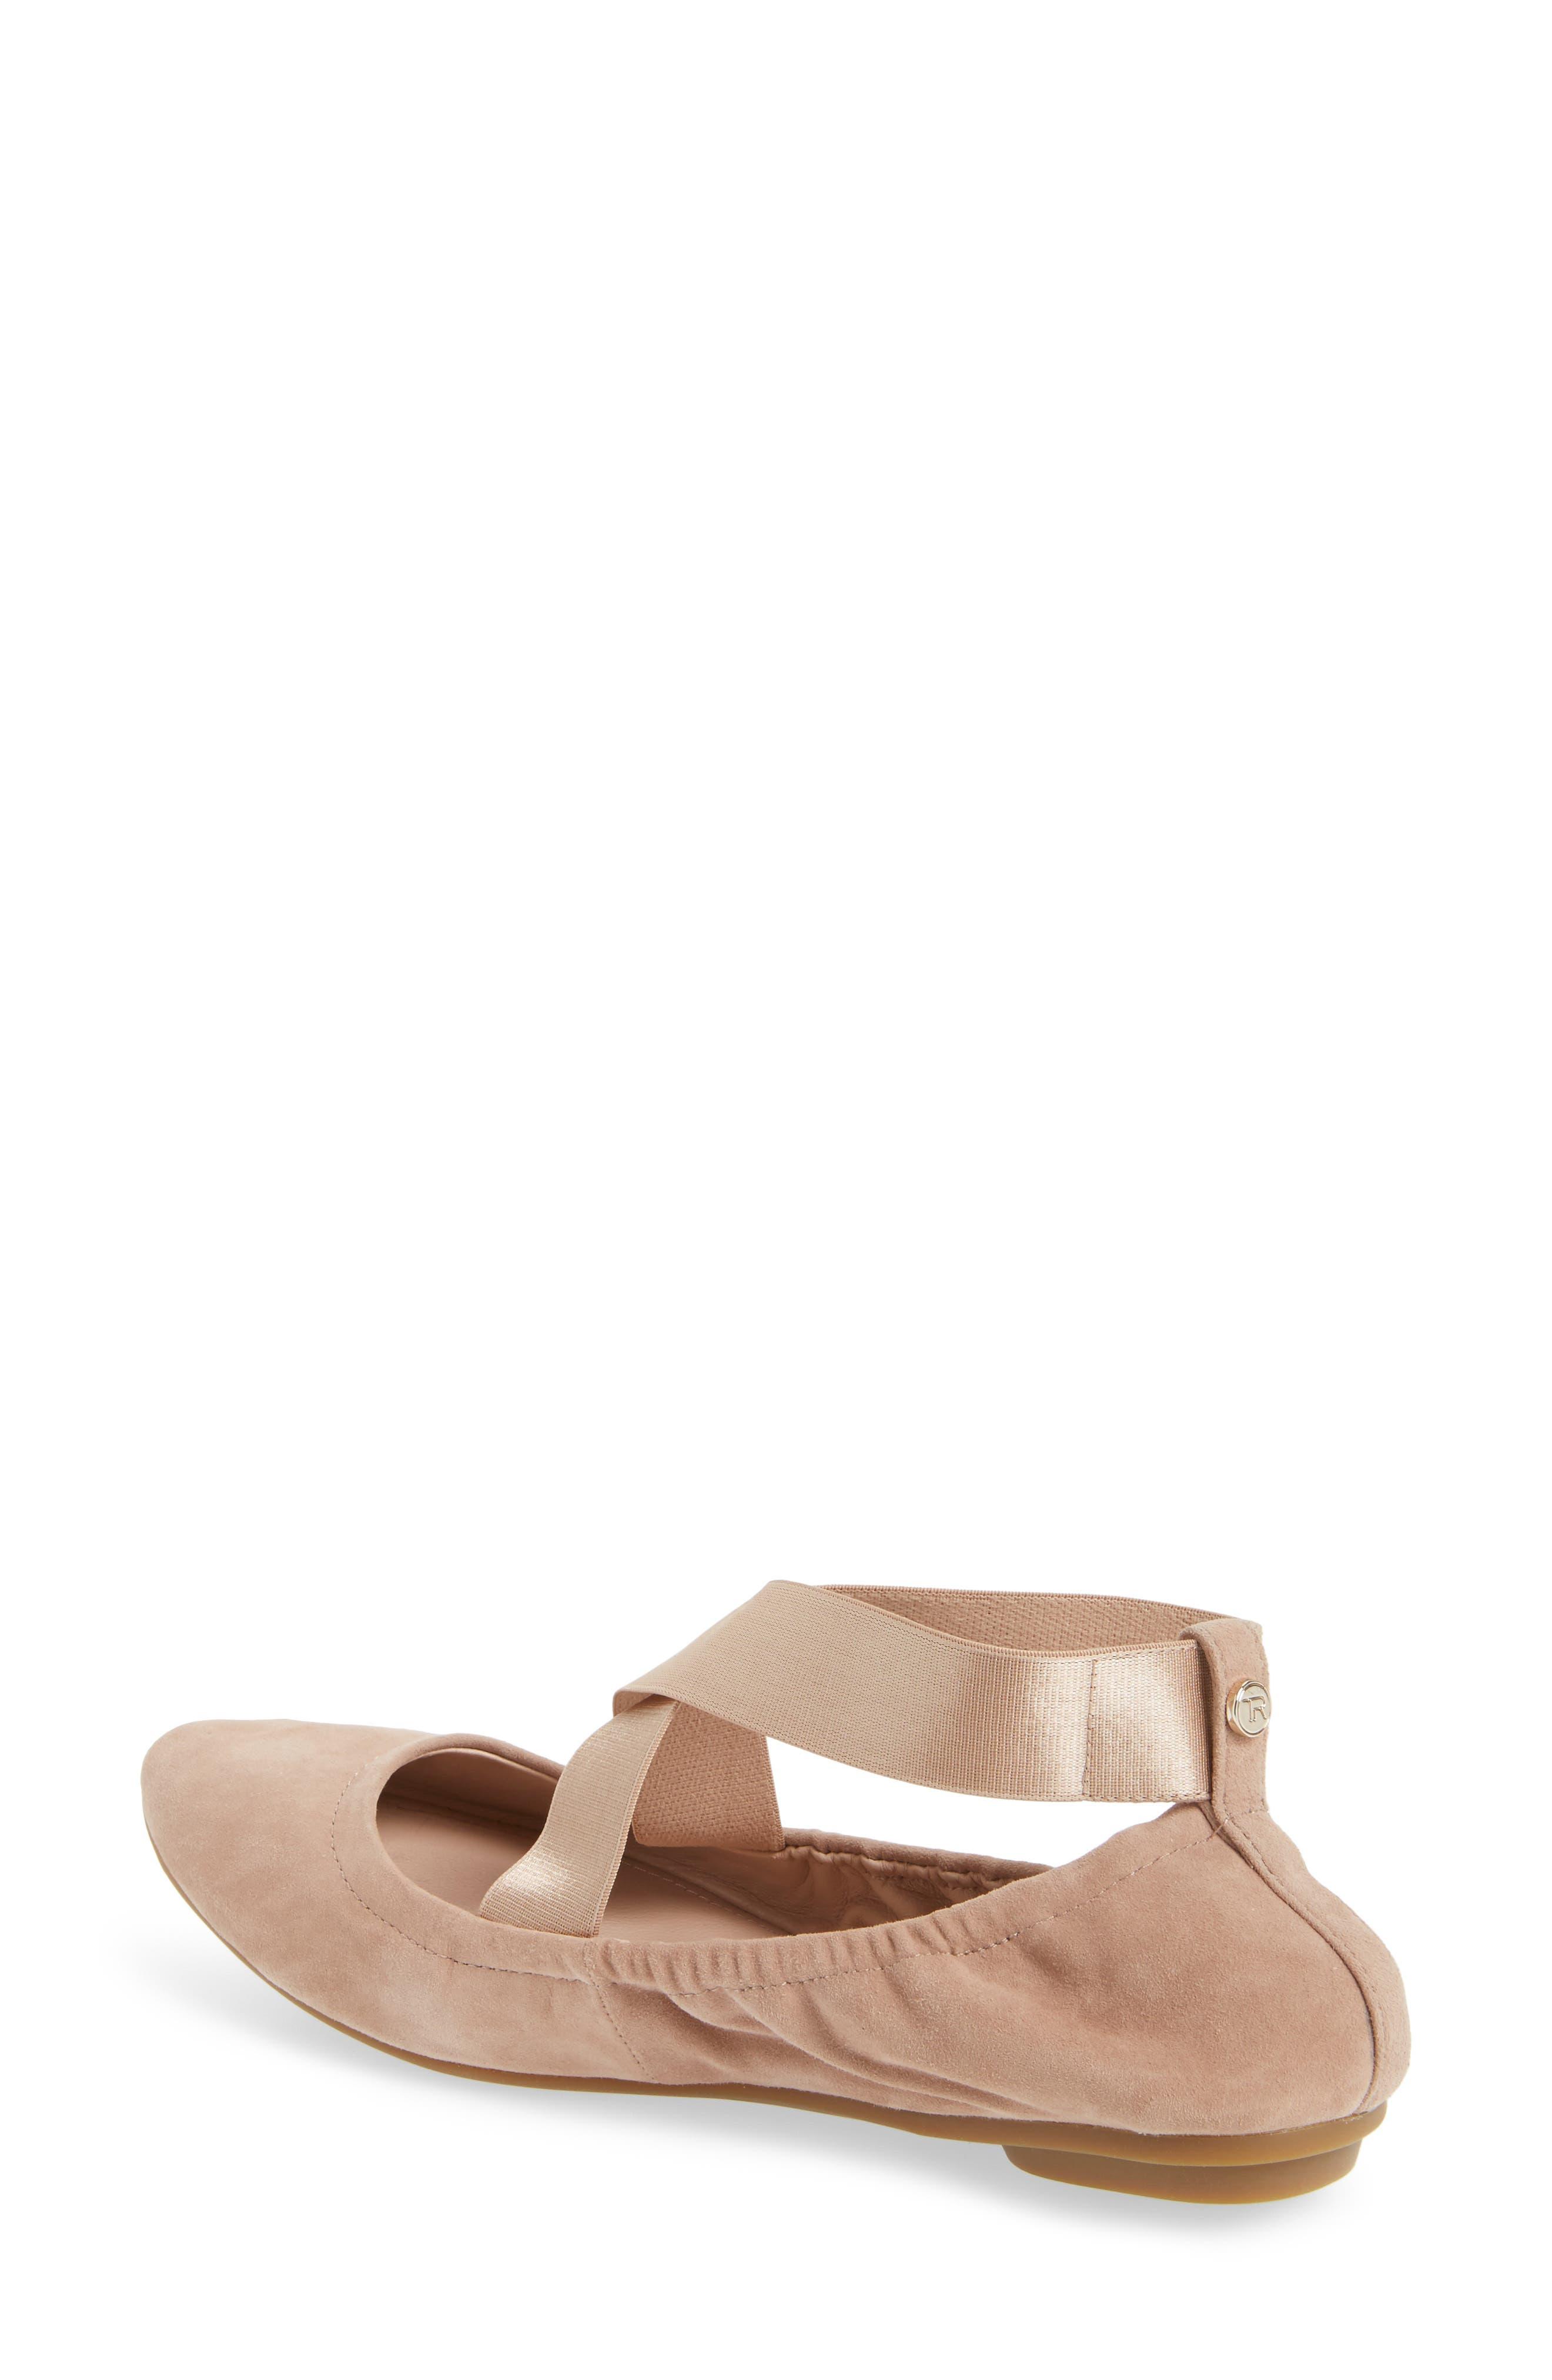 Edina Strappy Ballet Flat,                             Alternate thumbnail 7, color,